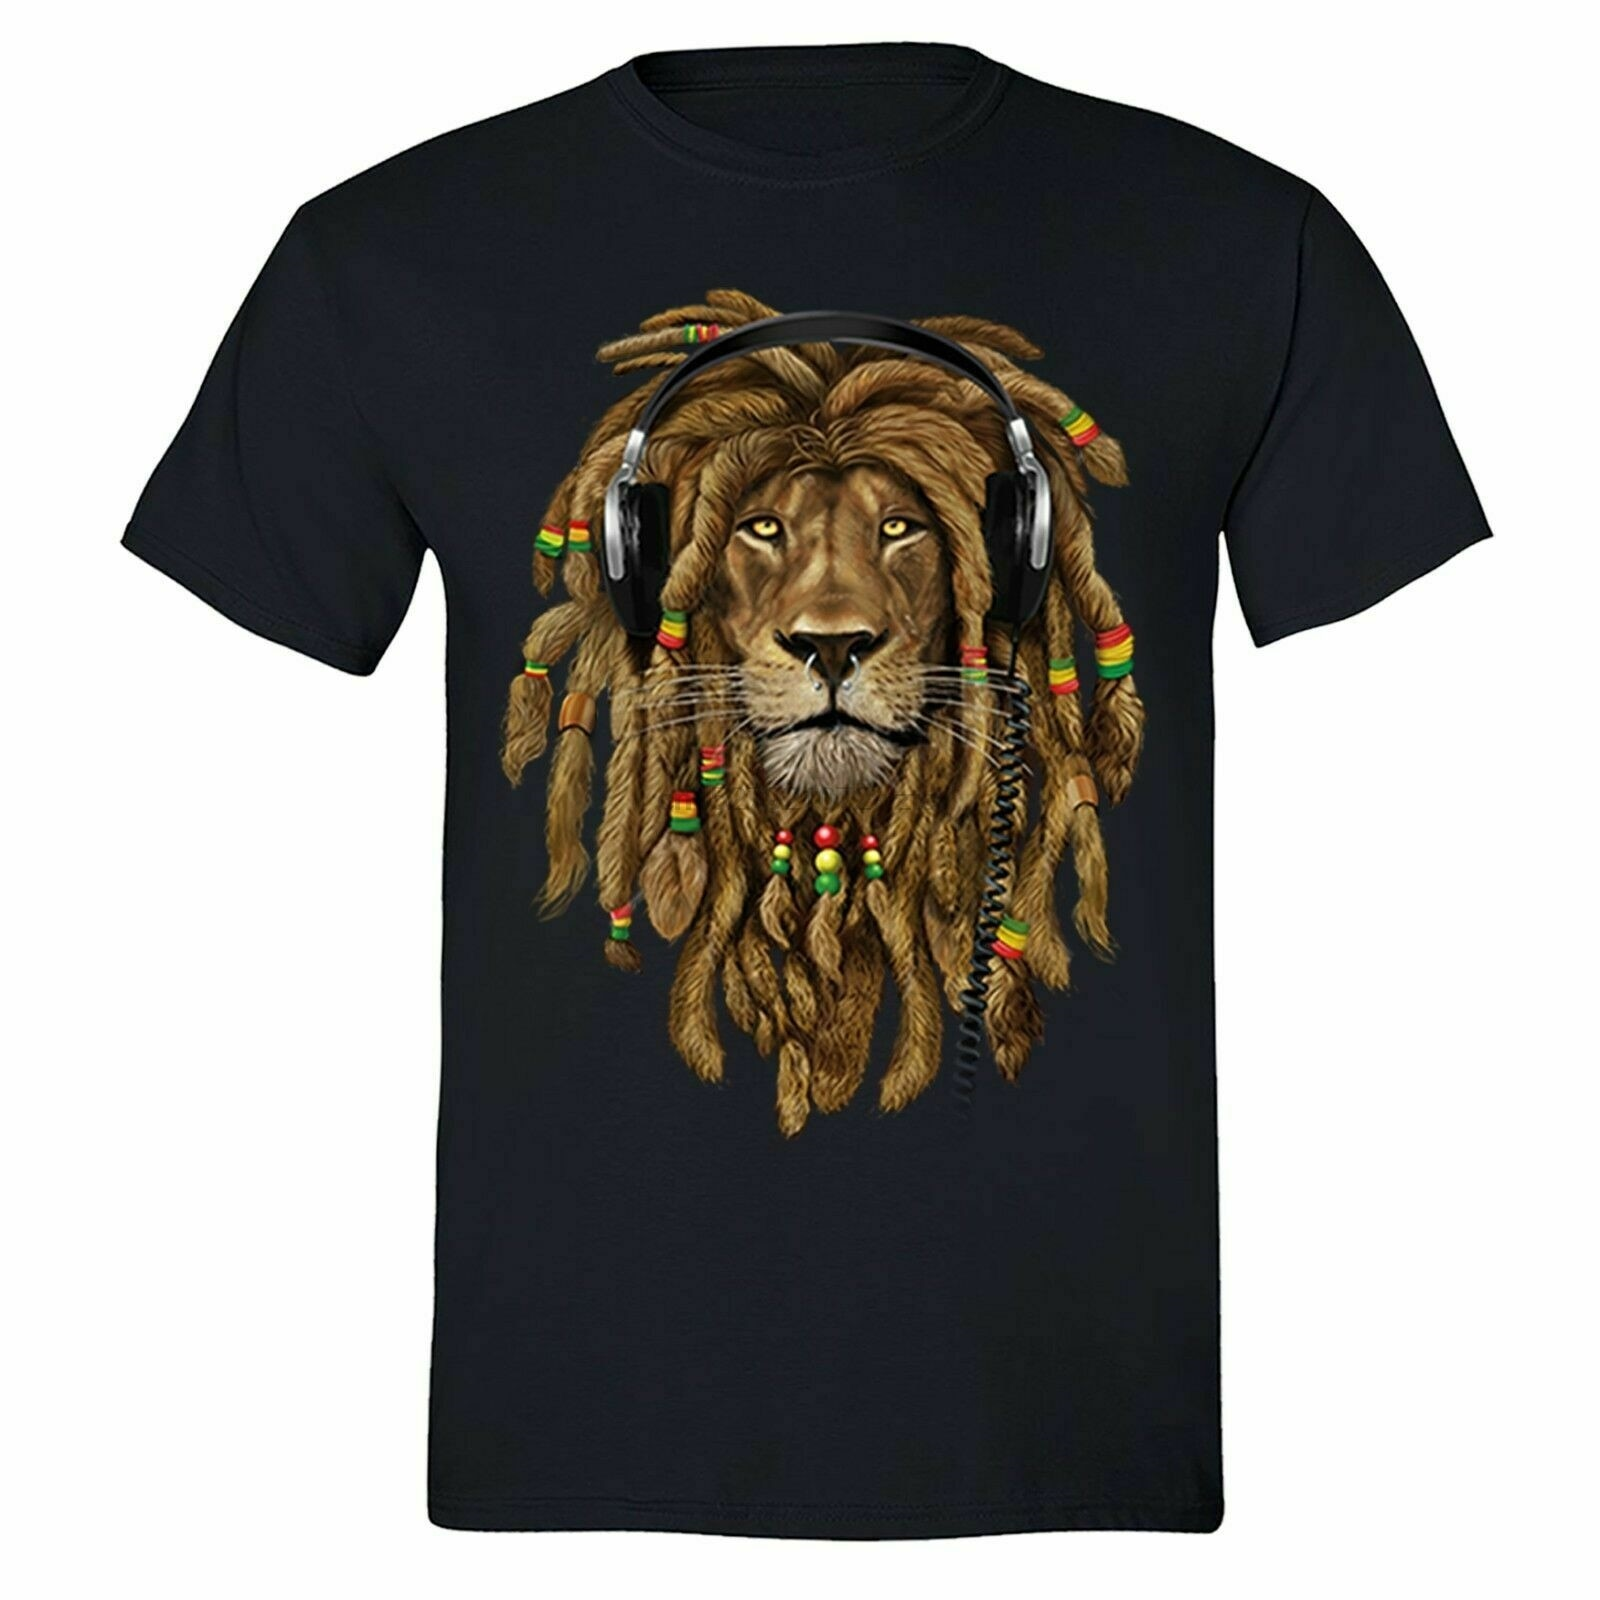 Rasta Lion of Judah T-shirt Headphones Jamaican Rastafari Zion  Tshirt